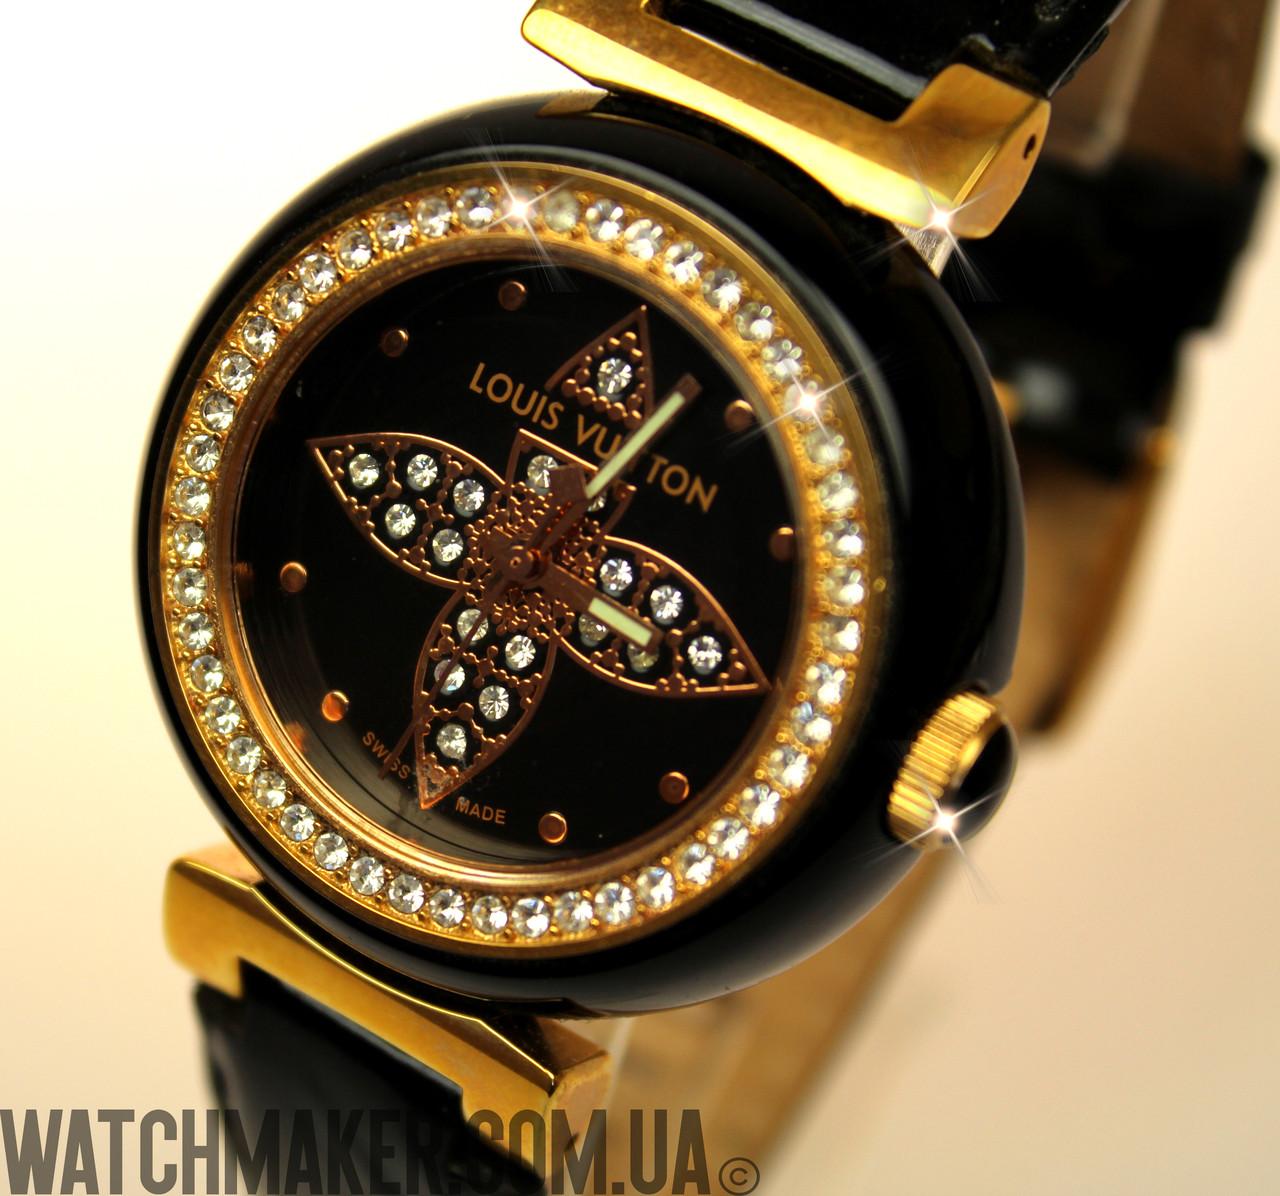 Женские наручные часы Louis Vuitton кварц